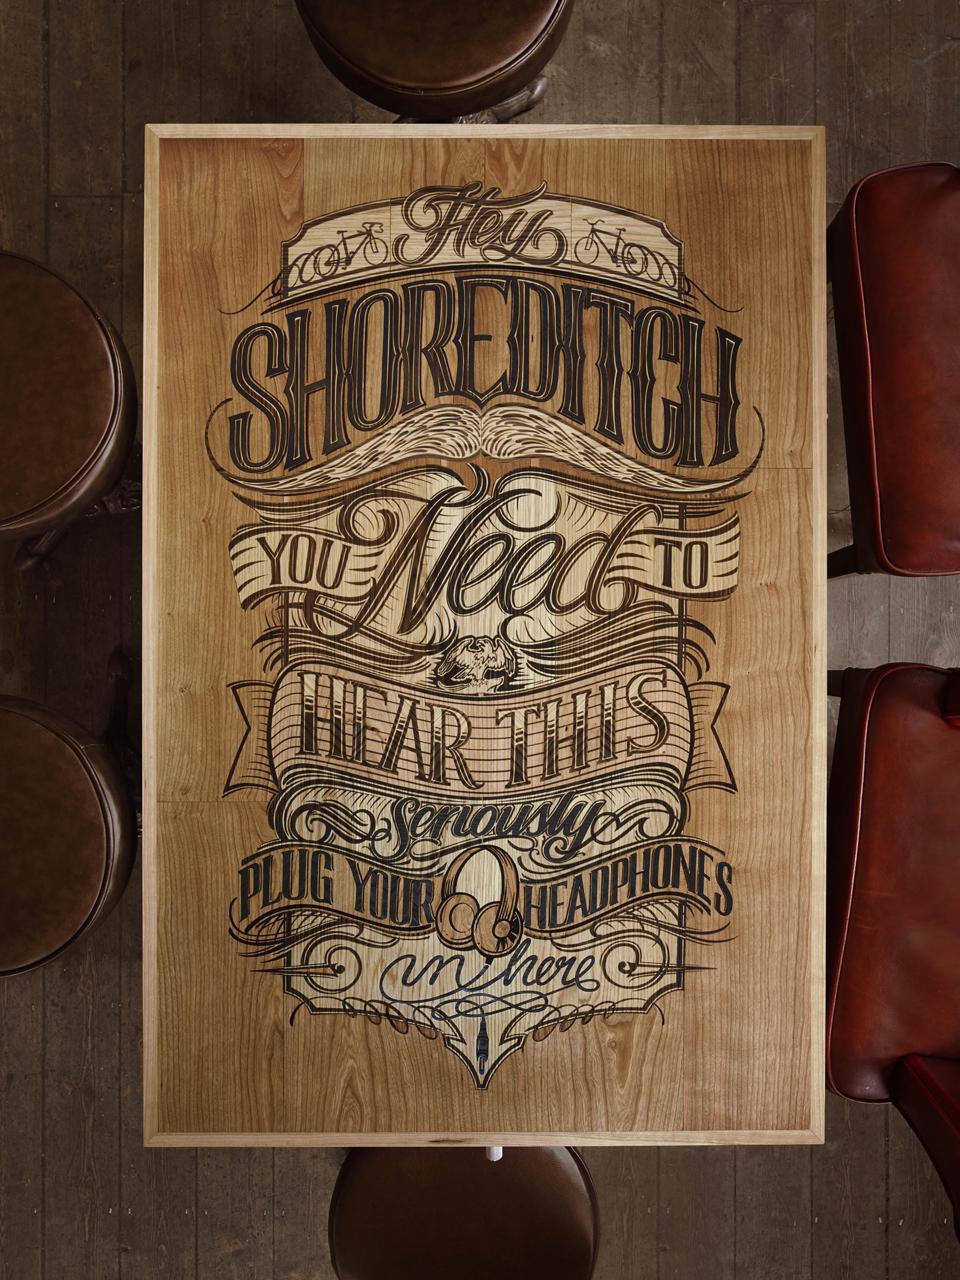 ShoreditchFull